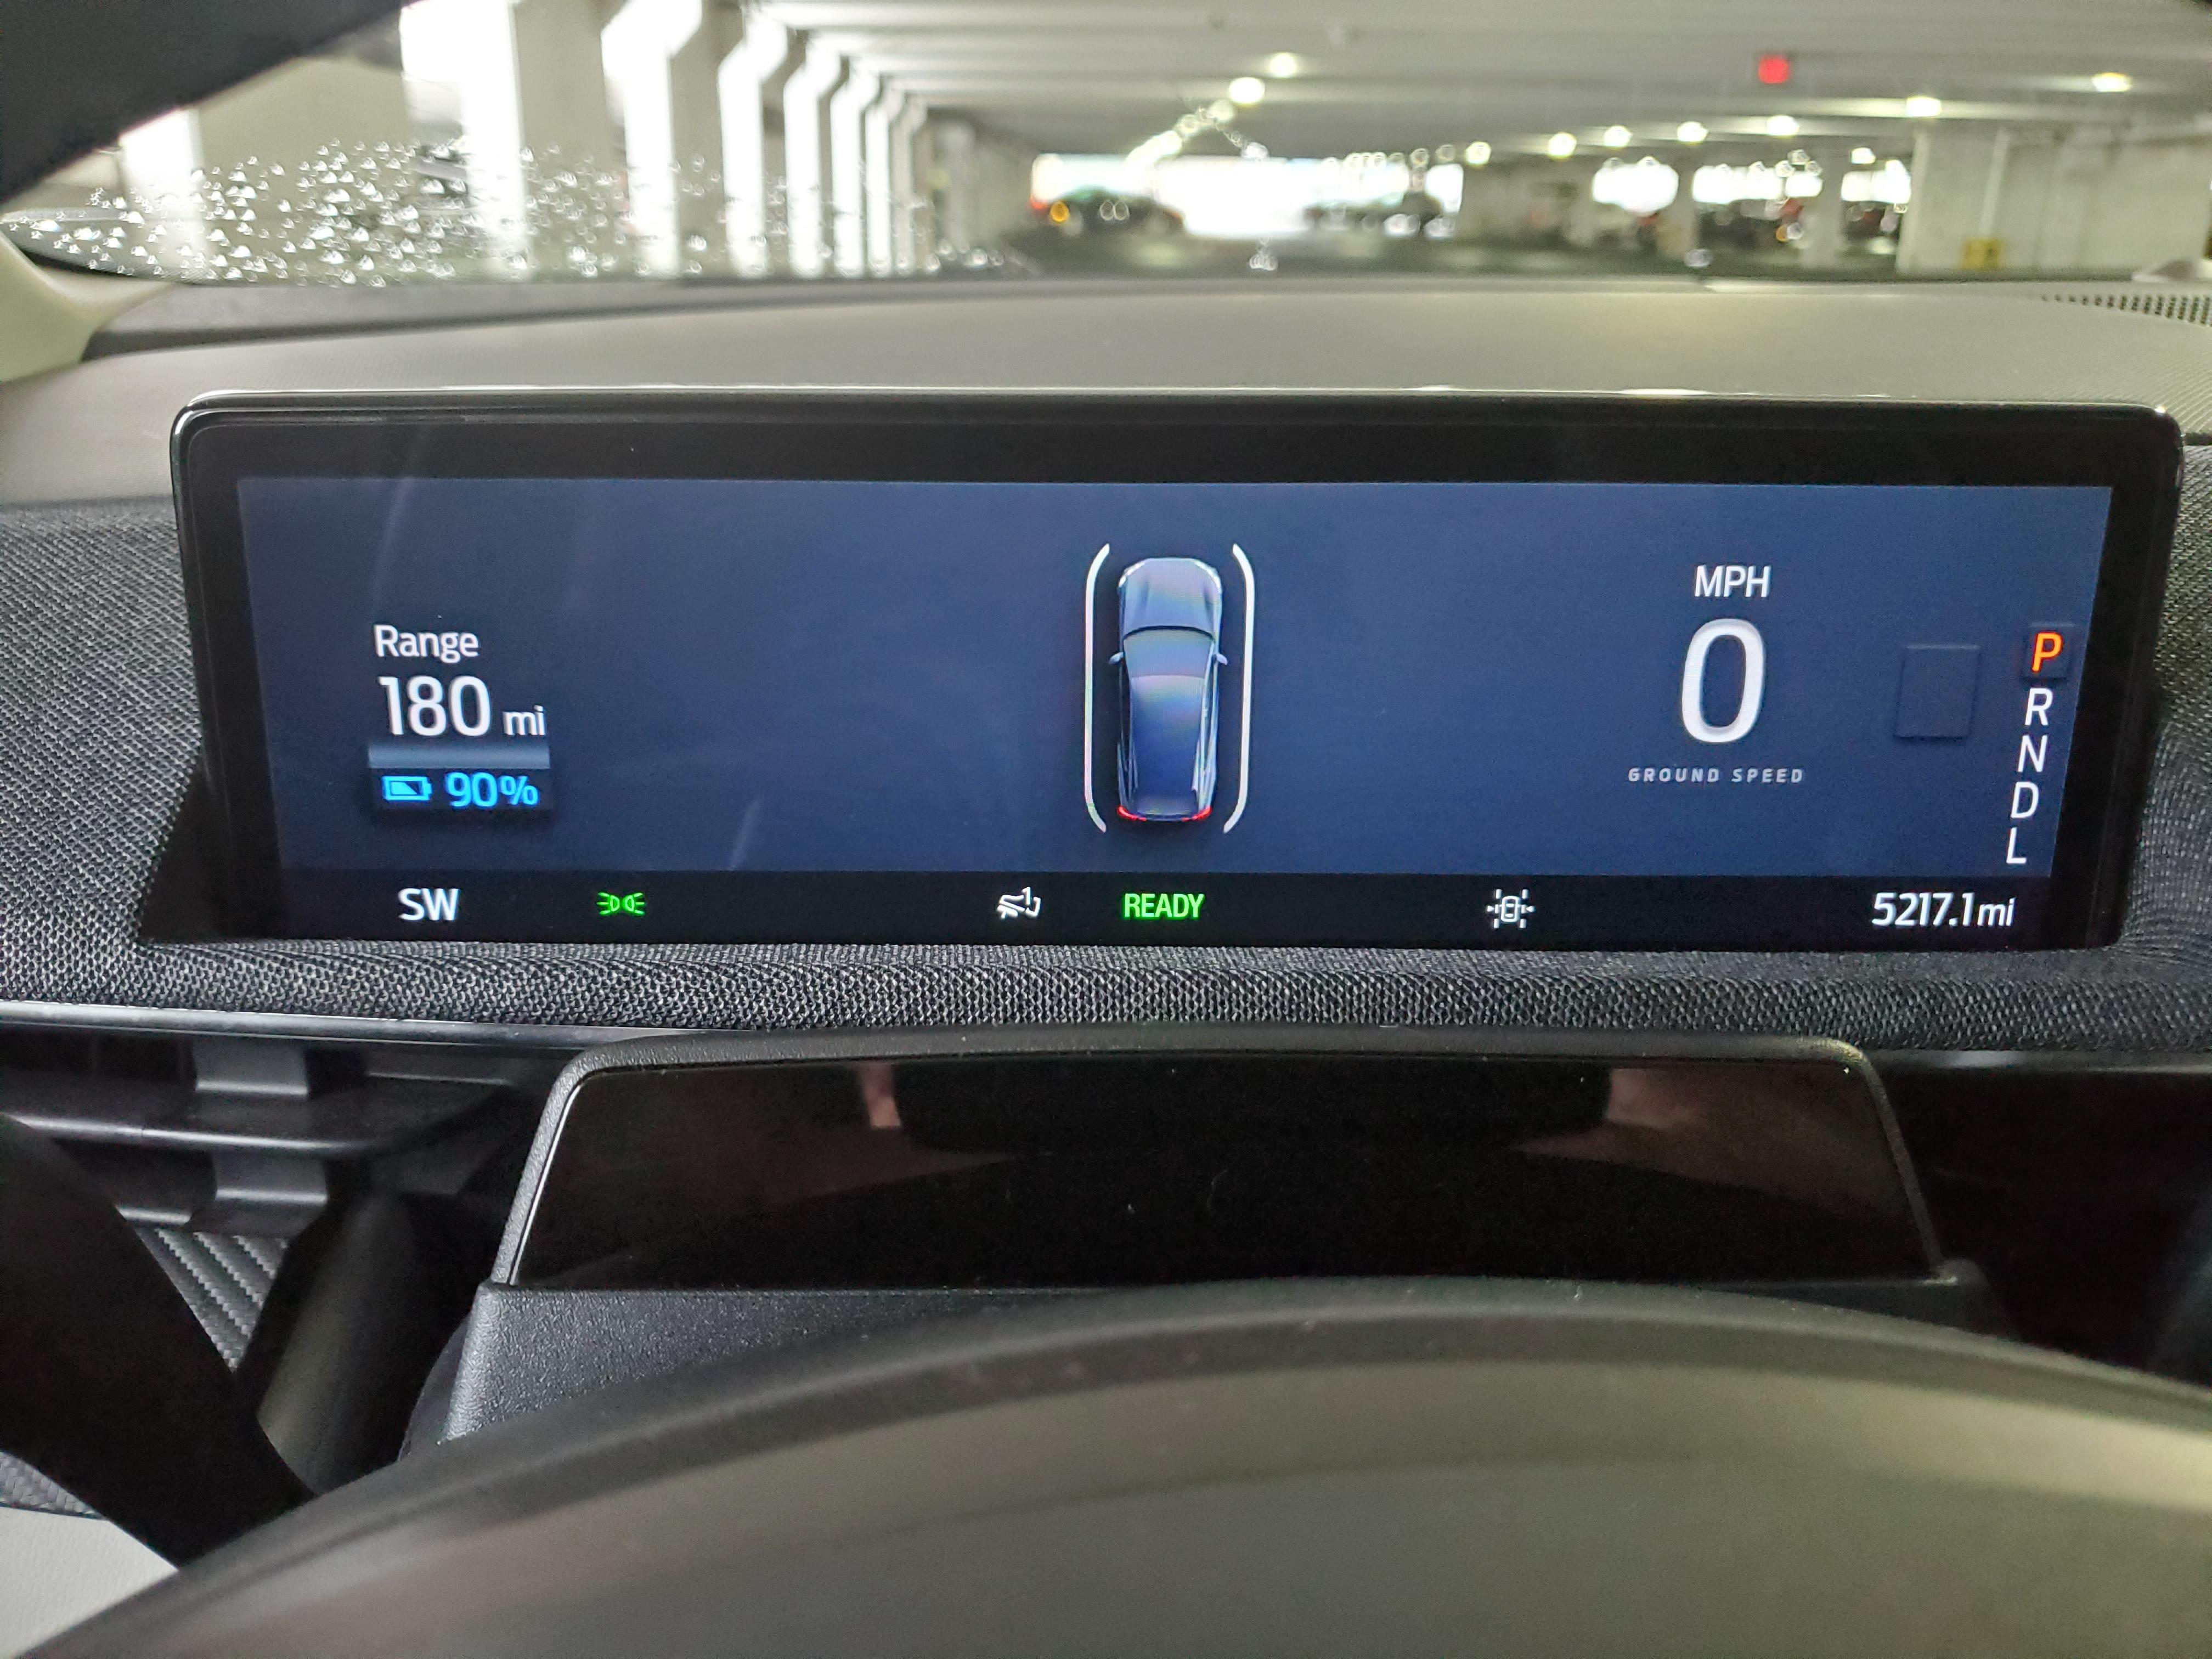 drivers gauge display on the Mache